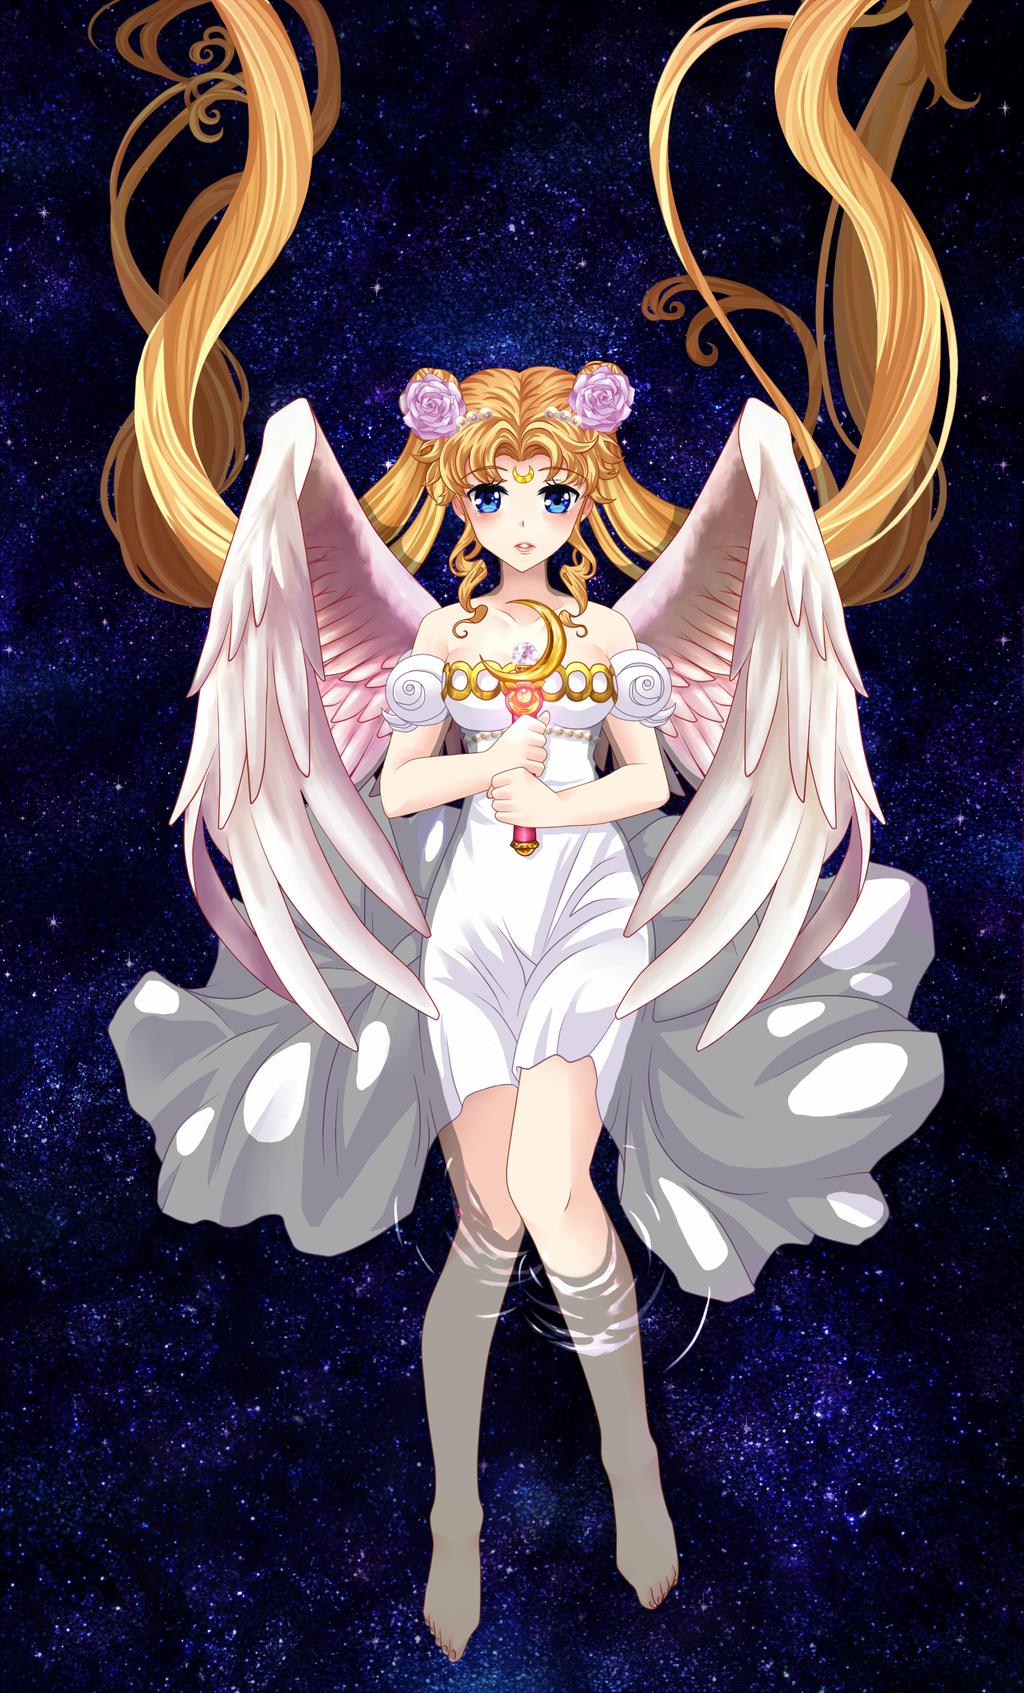 Princess Serenity by Ichigokitten